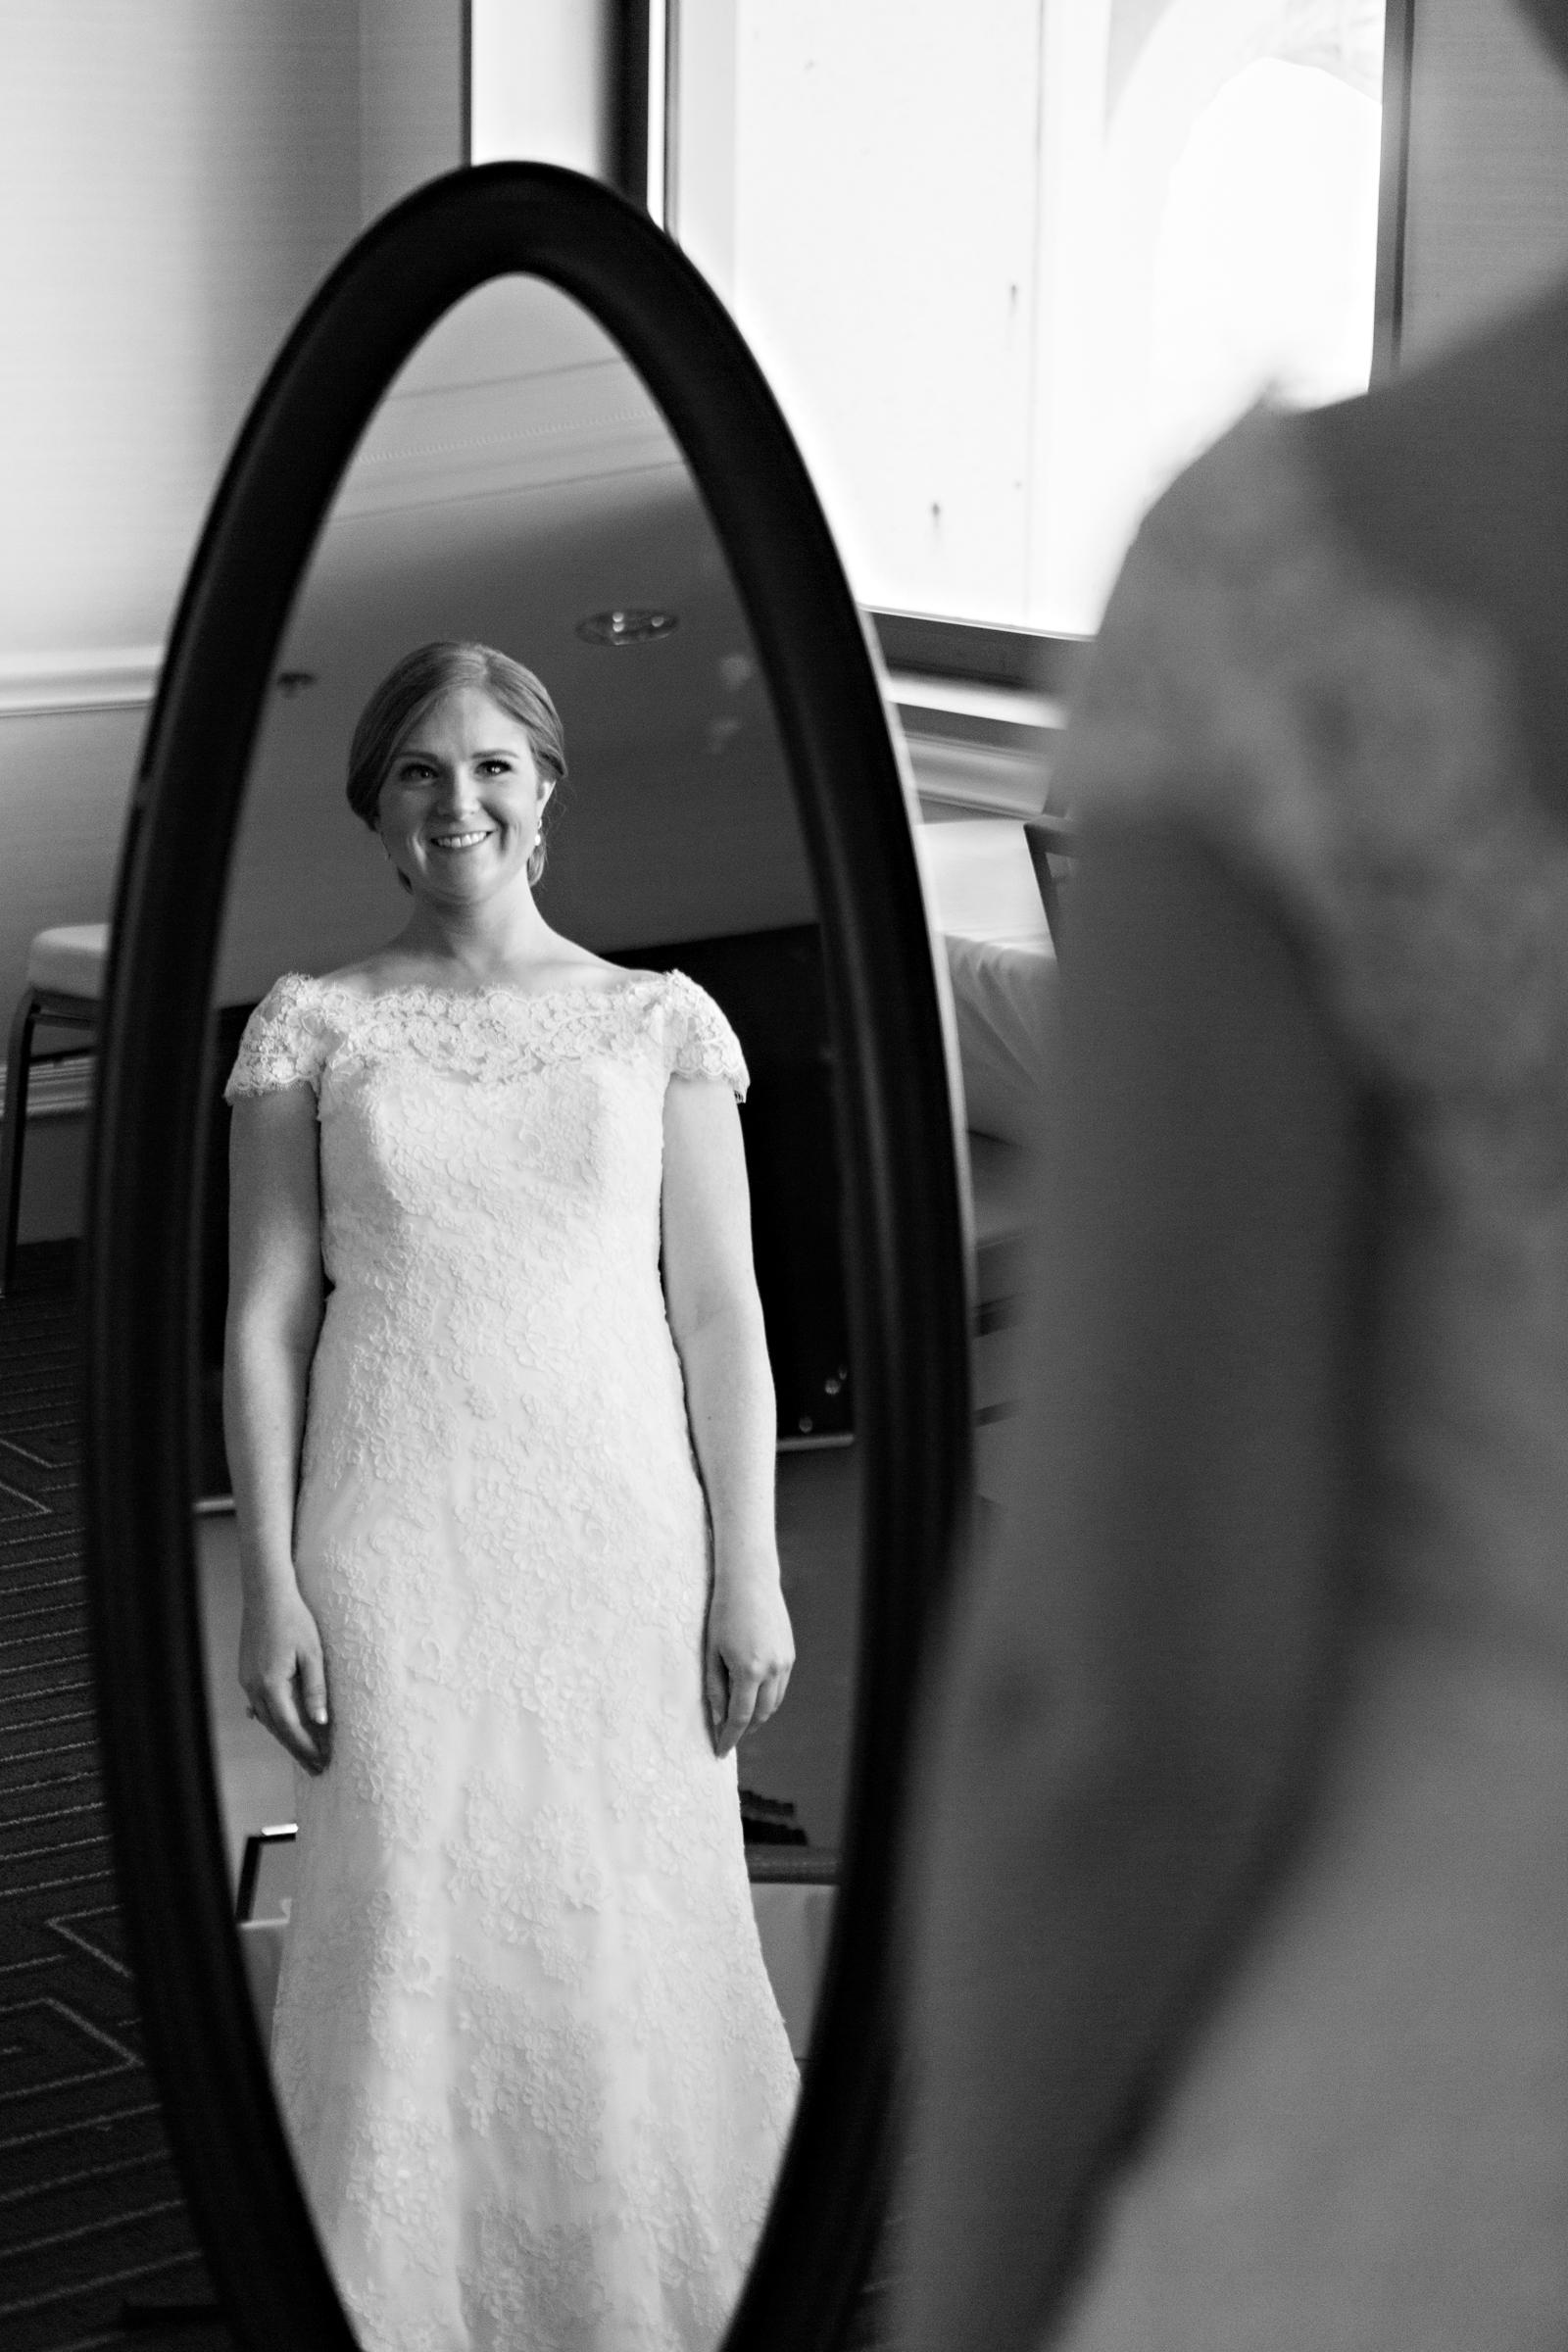 Matty-Drollette-Photography-Weddings-Montgomery-Alabama-105.jpg